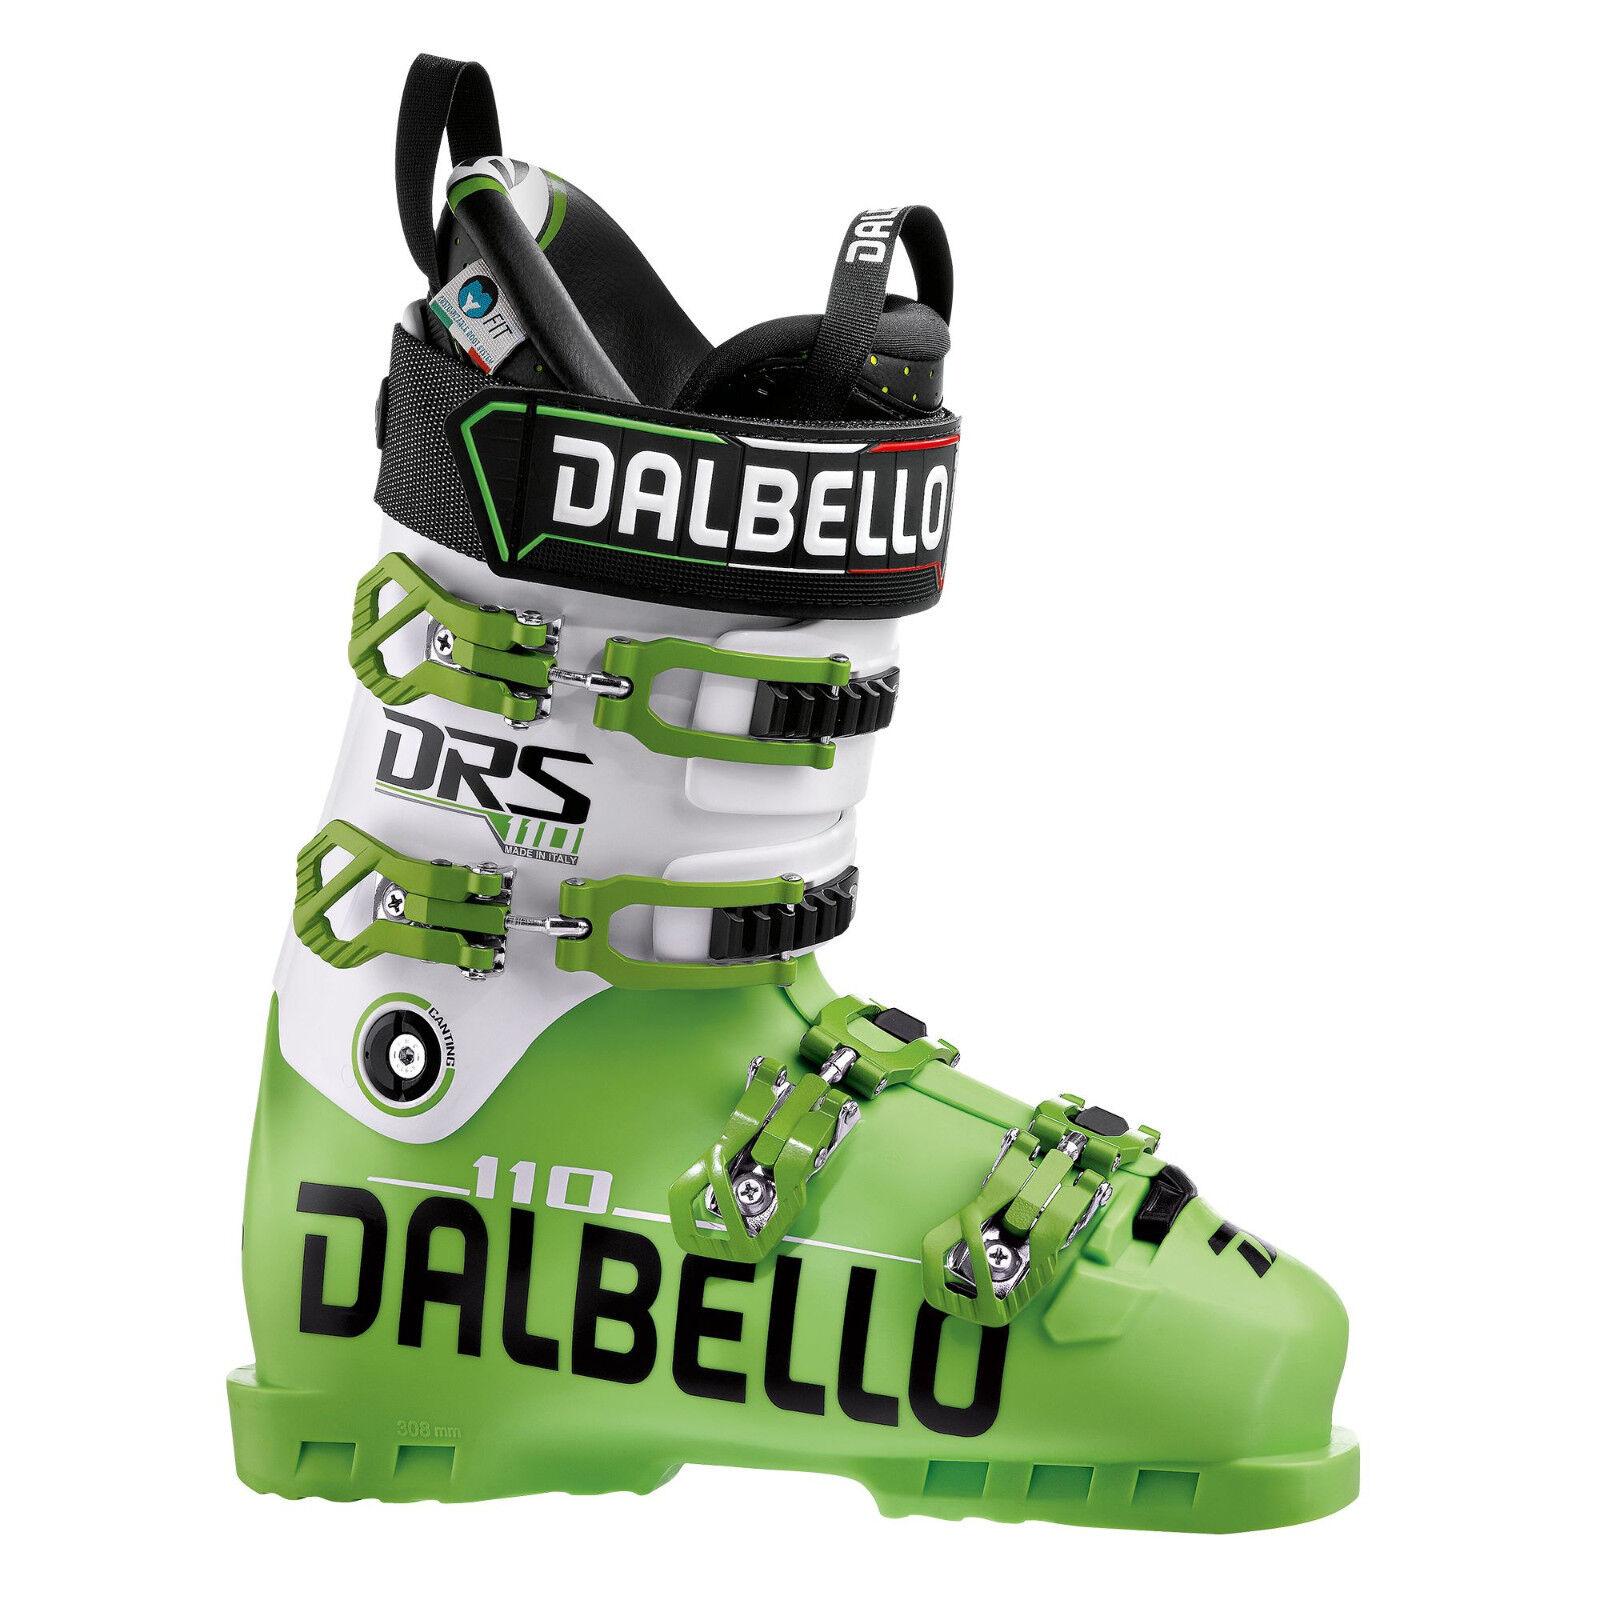 DALBELLO Skischuh DRS 110 RACE MP 295 EU 45.5